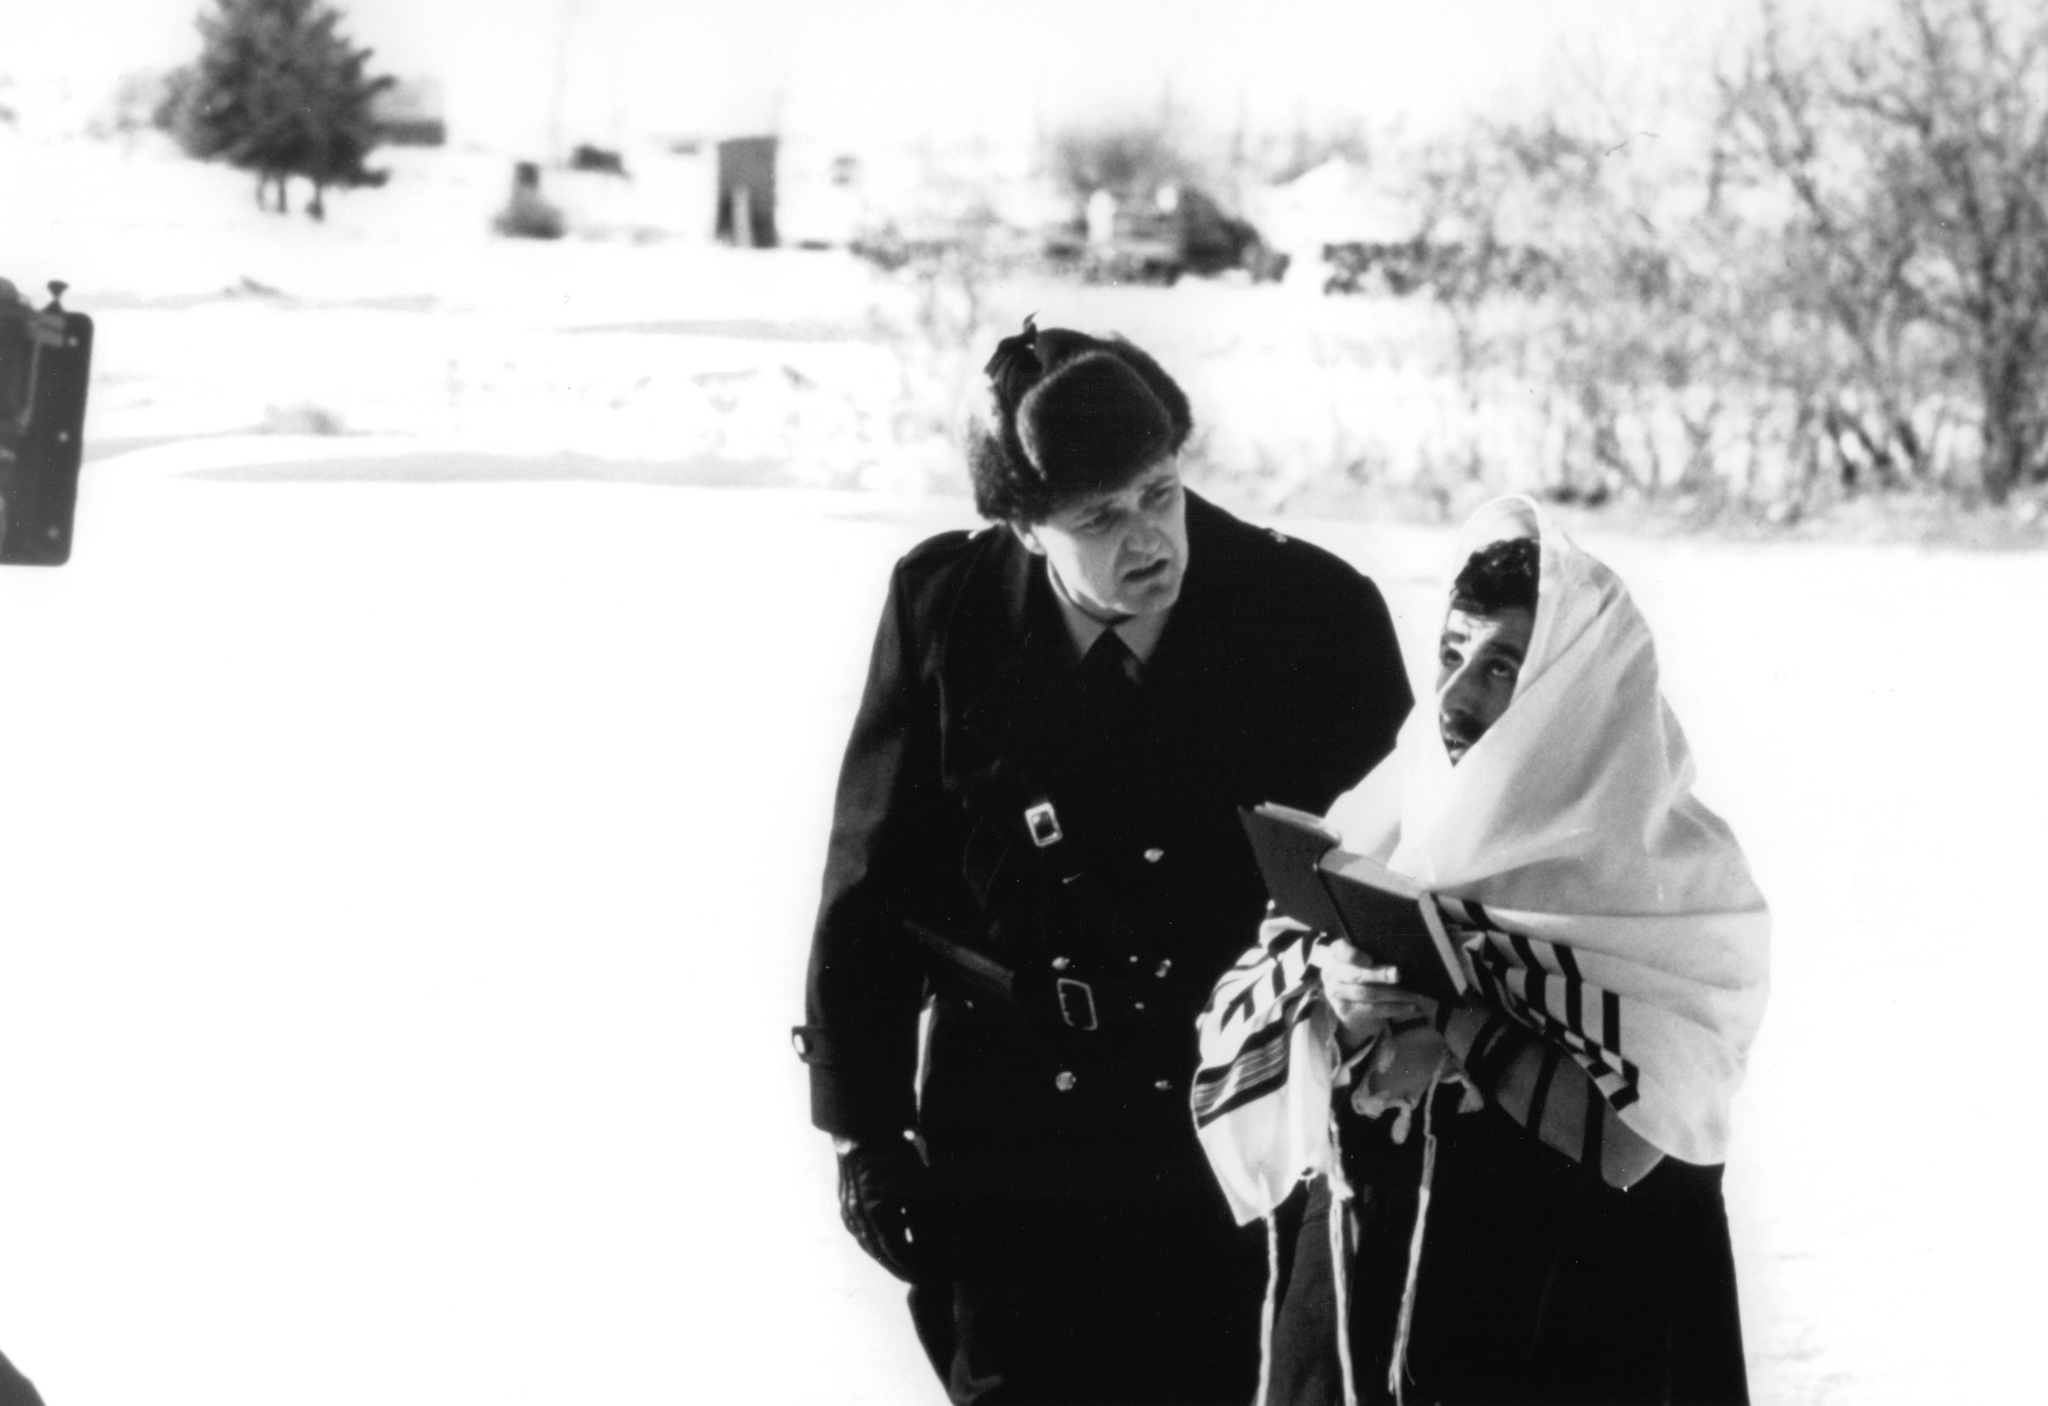 Saul Rubinek in The Outside Chance of Maximilian Glick (1988)